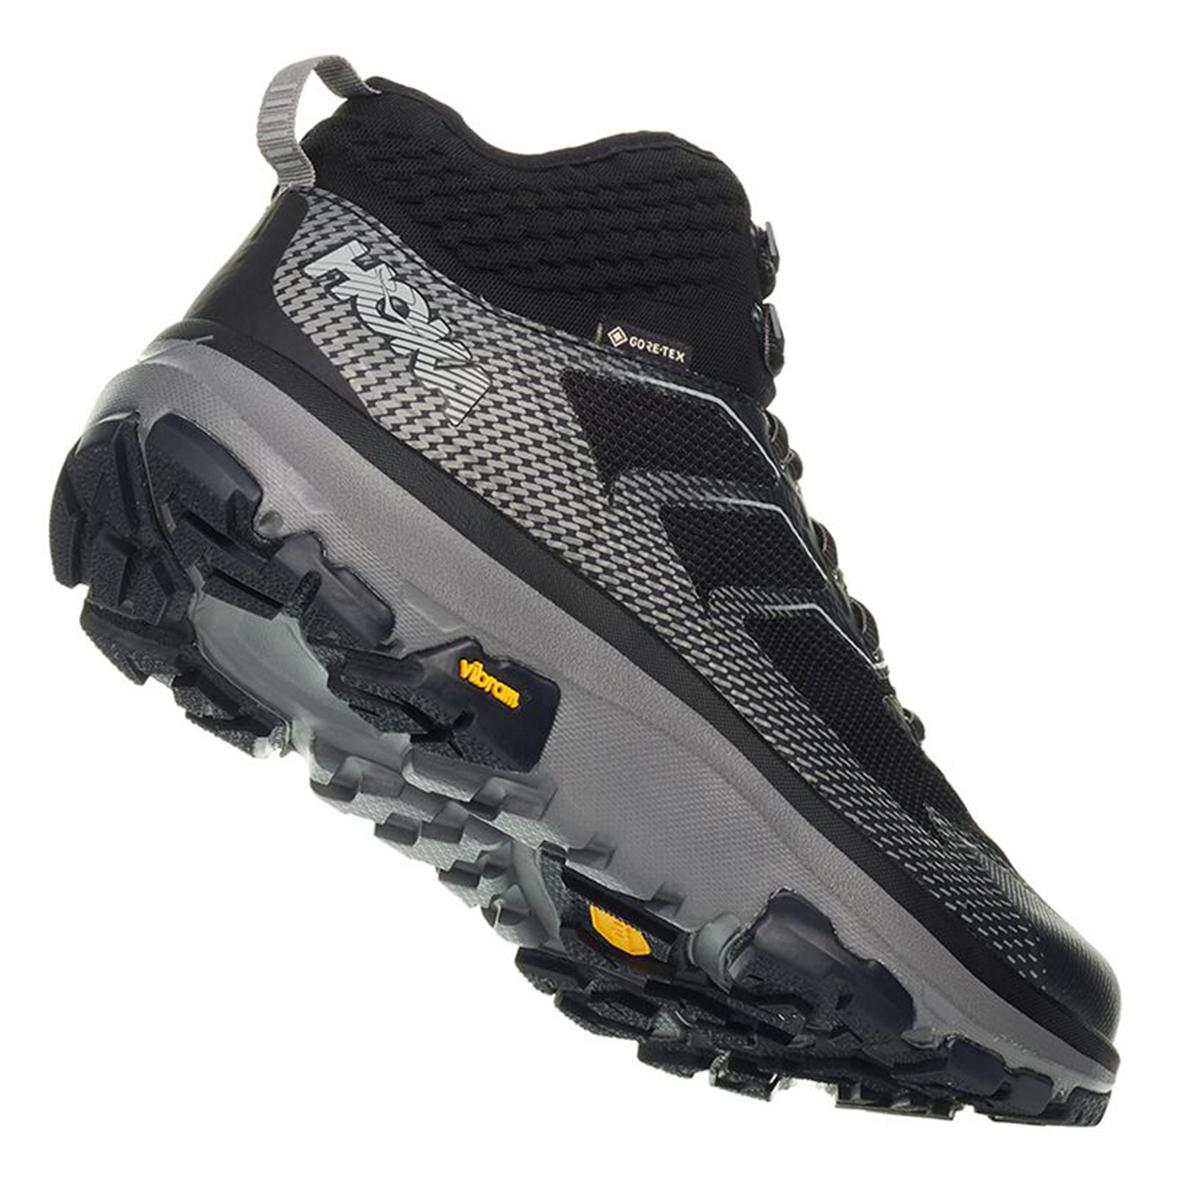 Men's Hoka One One Sky Toa Gore-Tex Trail Running Shoe - Color: Phantom - Size: 7 - Width: Regular, Phantom, large, image 6